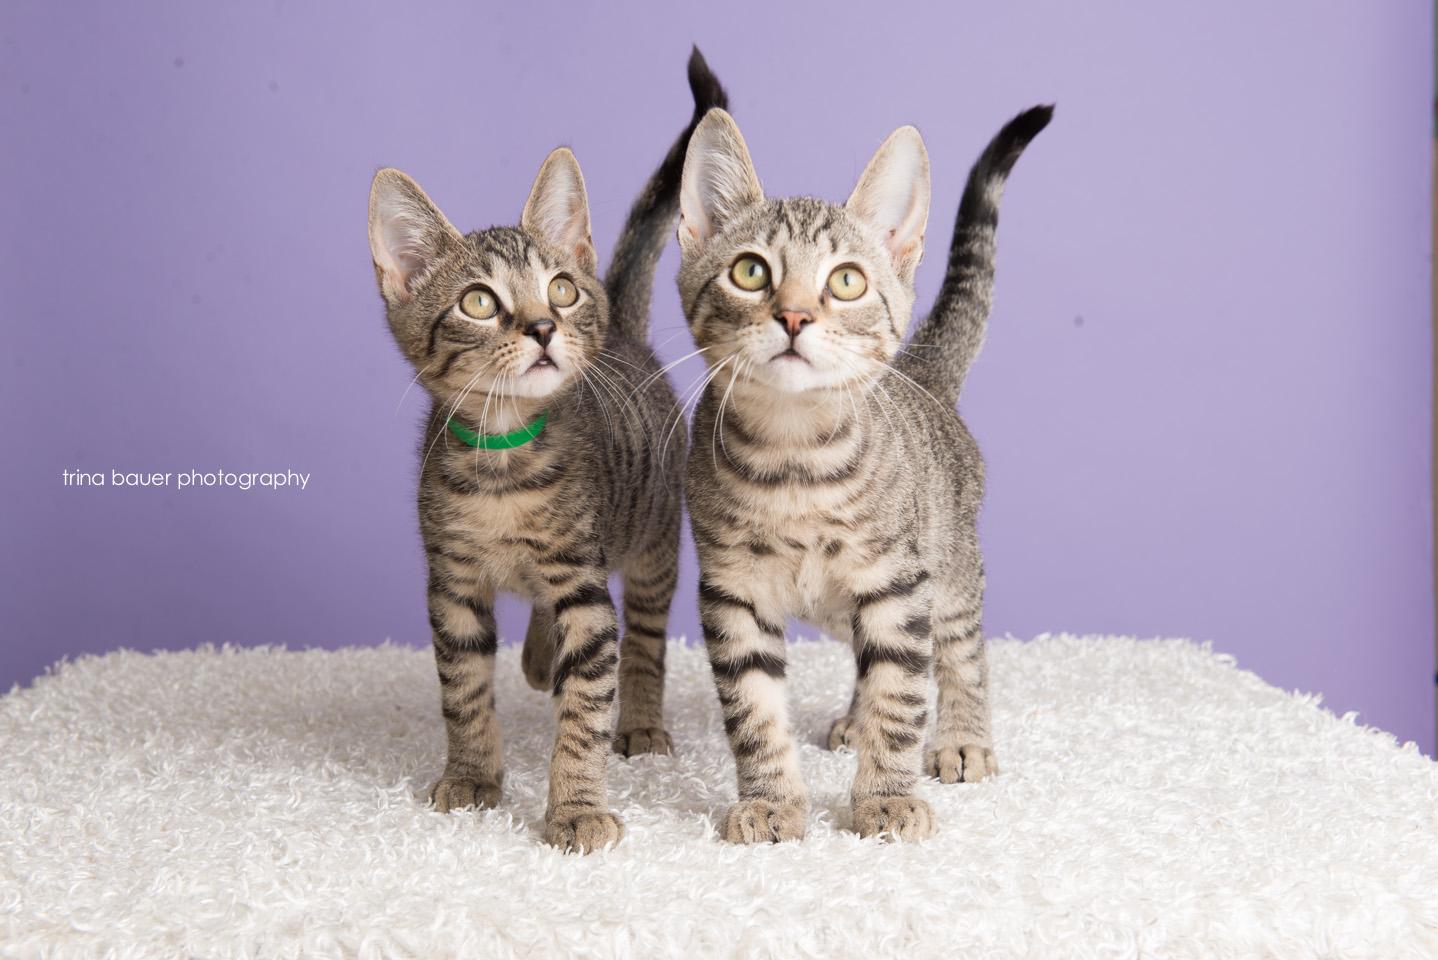 trina-bauer-photography-kittens-gray-tabby